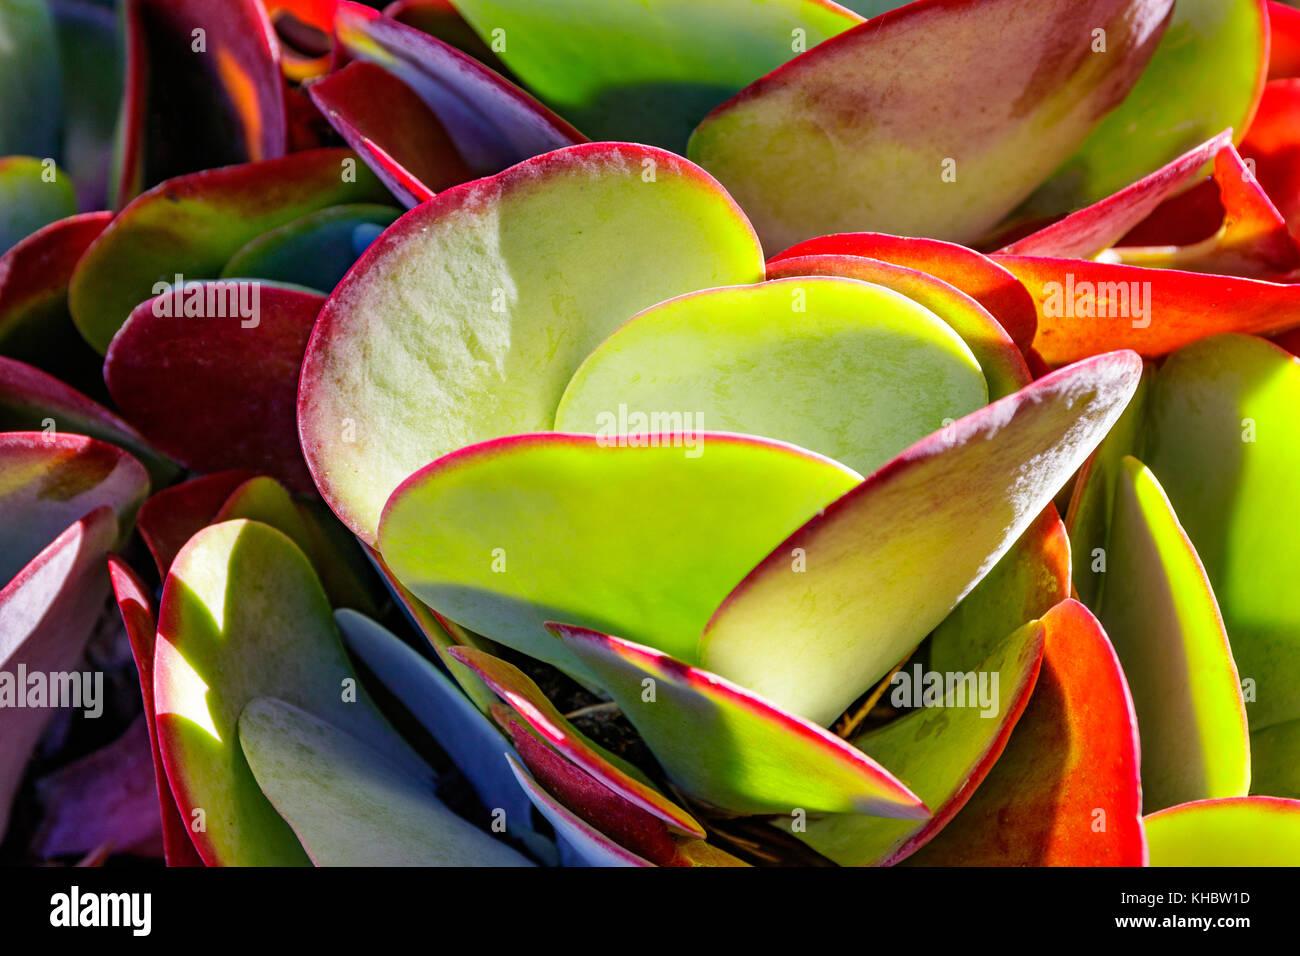 Paddle succulent, Flap jack plant, Kalanchoe - Stock Image